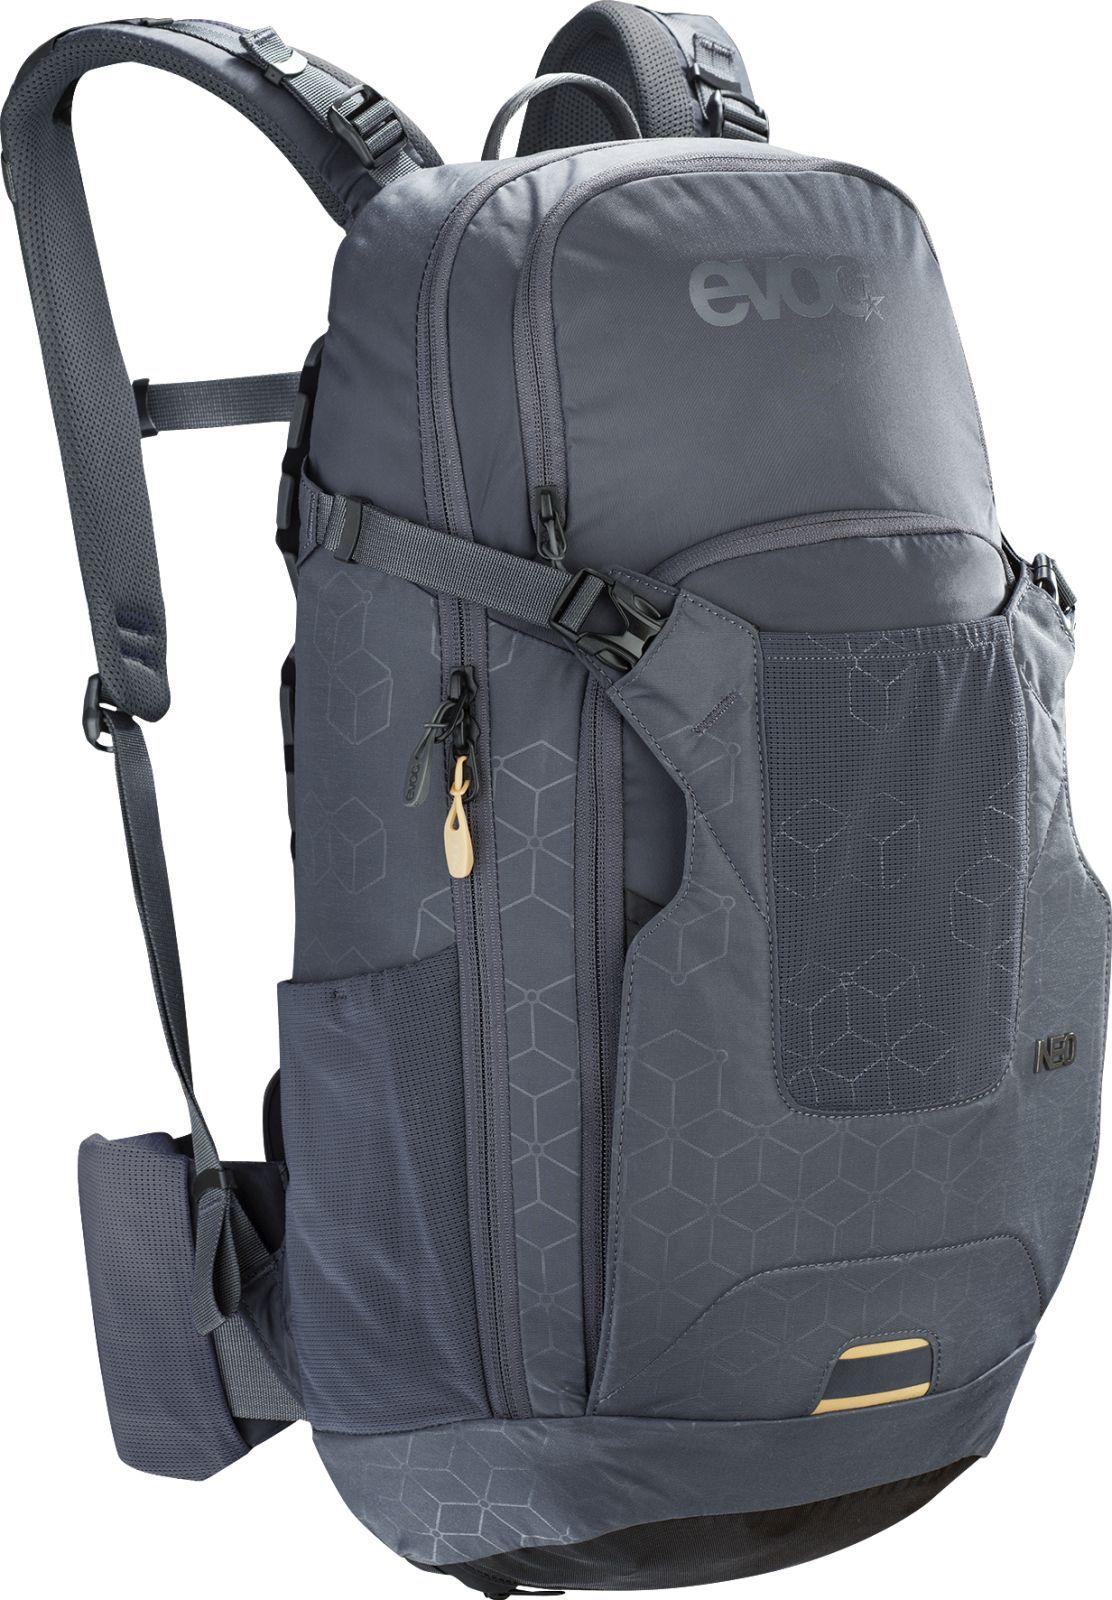 Evoc Neo 16L - carbon grey S/M